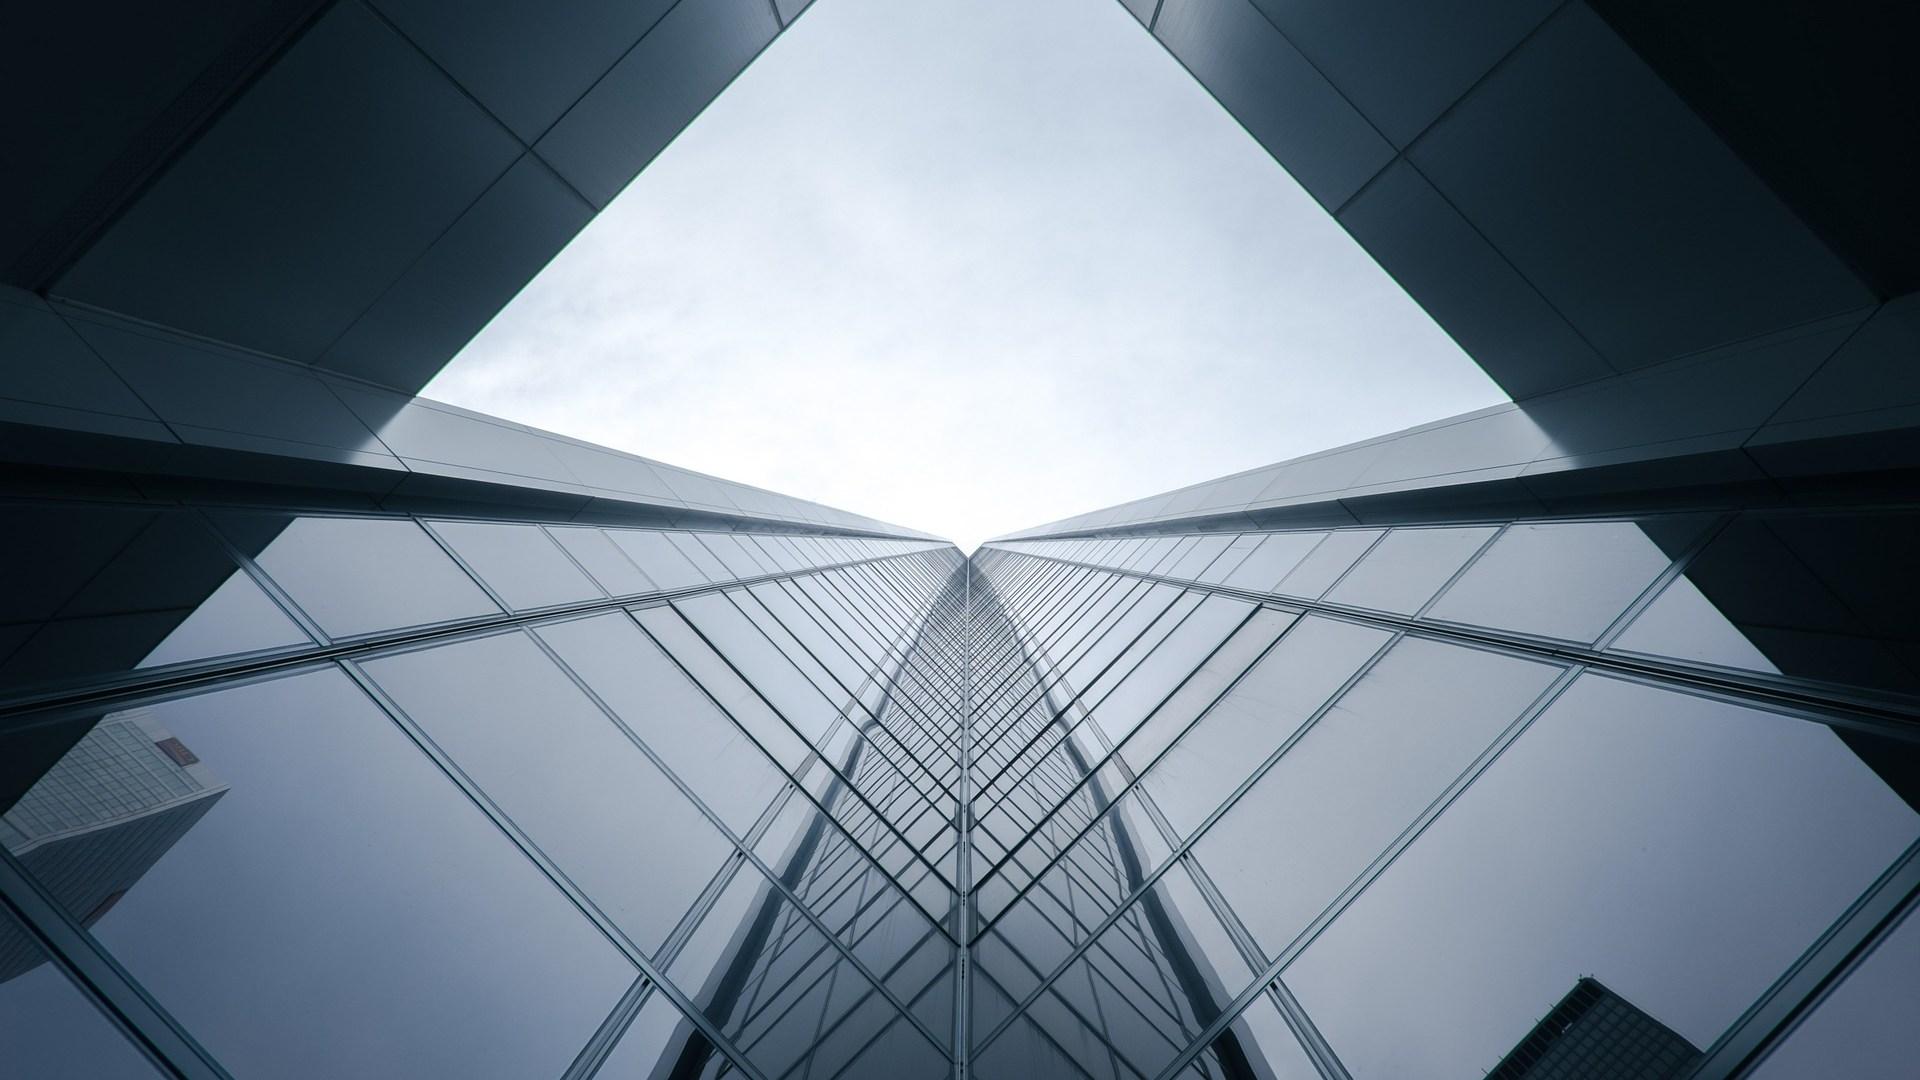 Arhitektonski ured A.1.B.K., Split